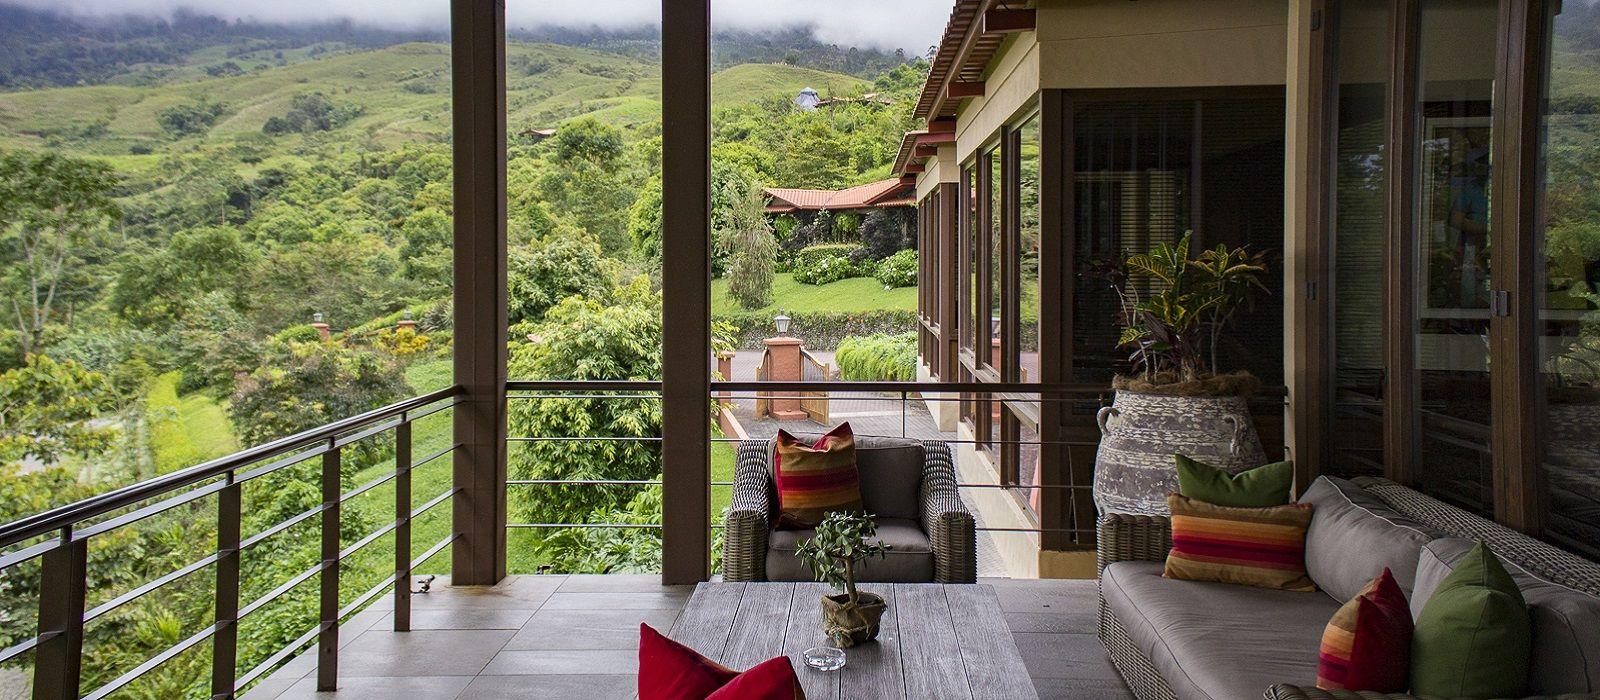 Costa Rica: Luxury in the Wild Tour Trip 2